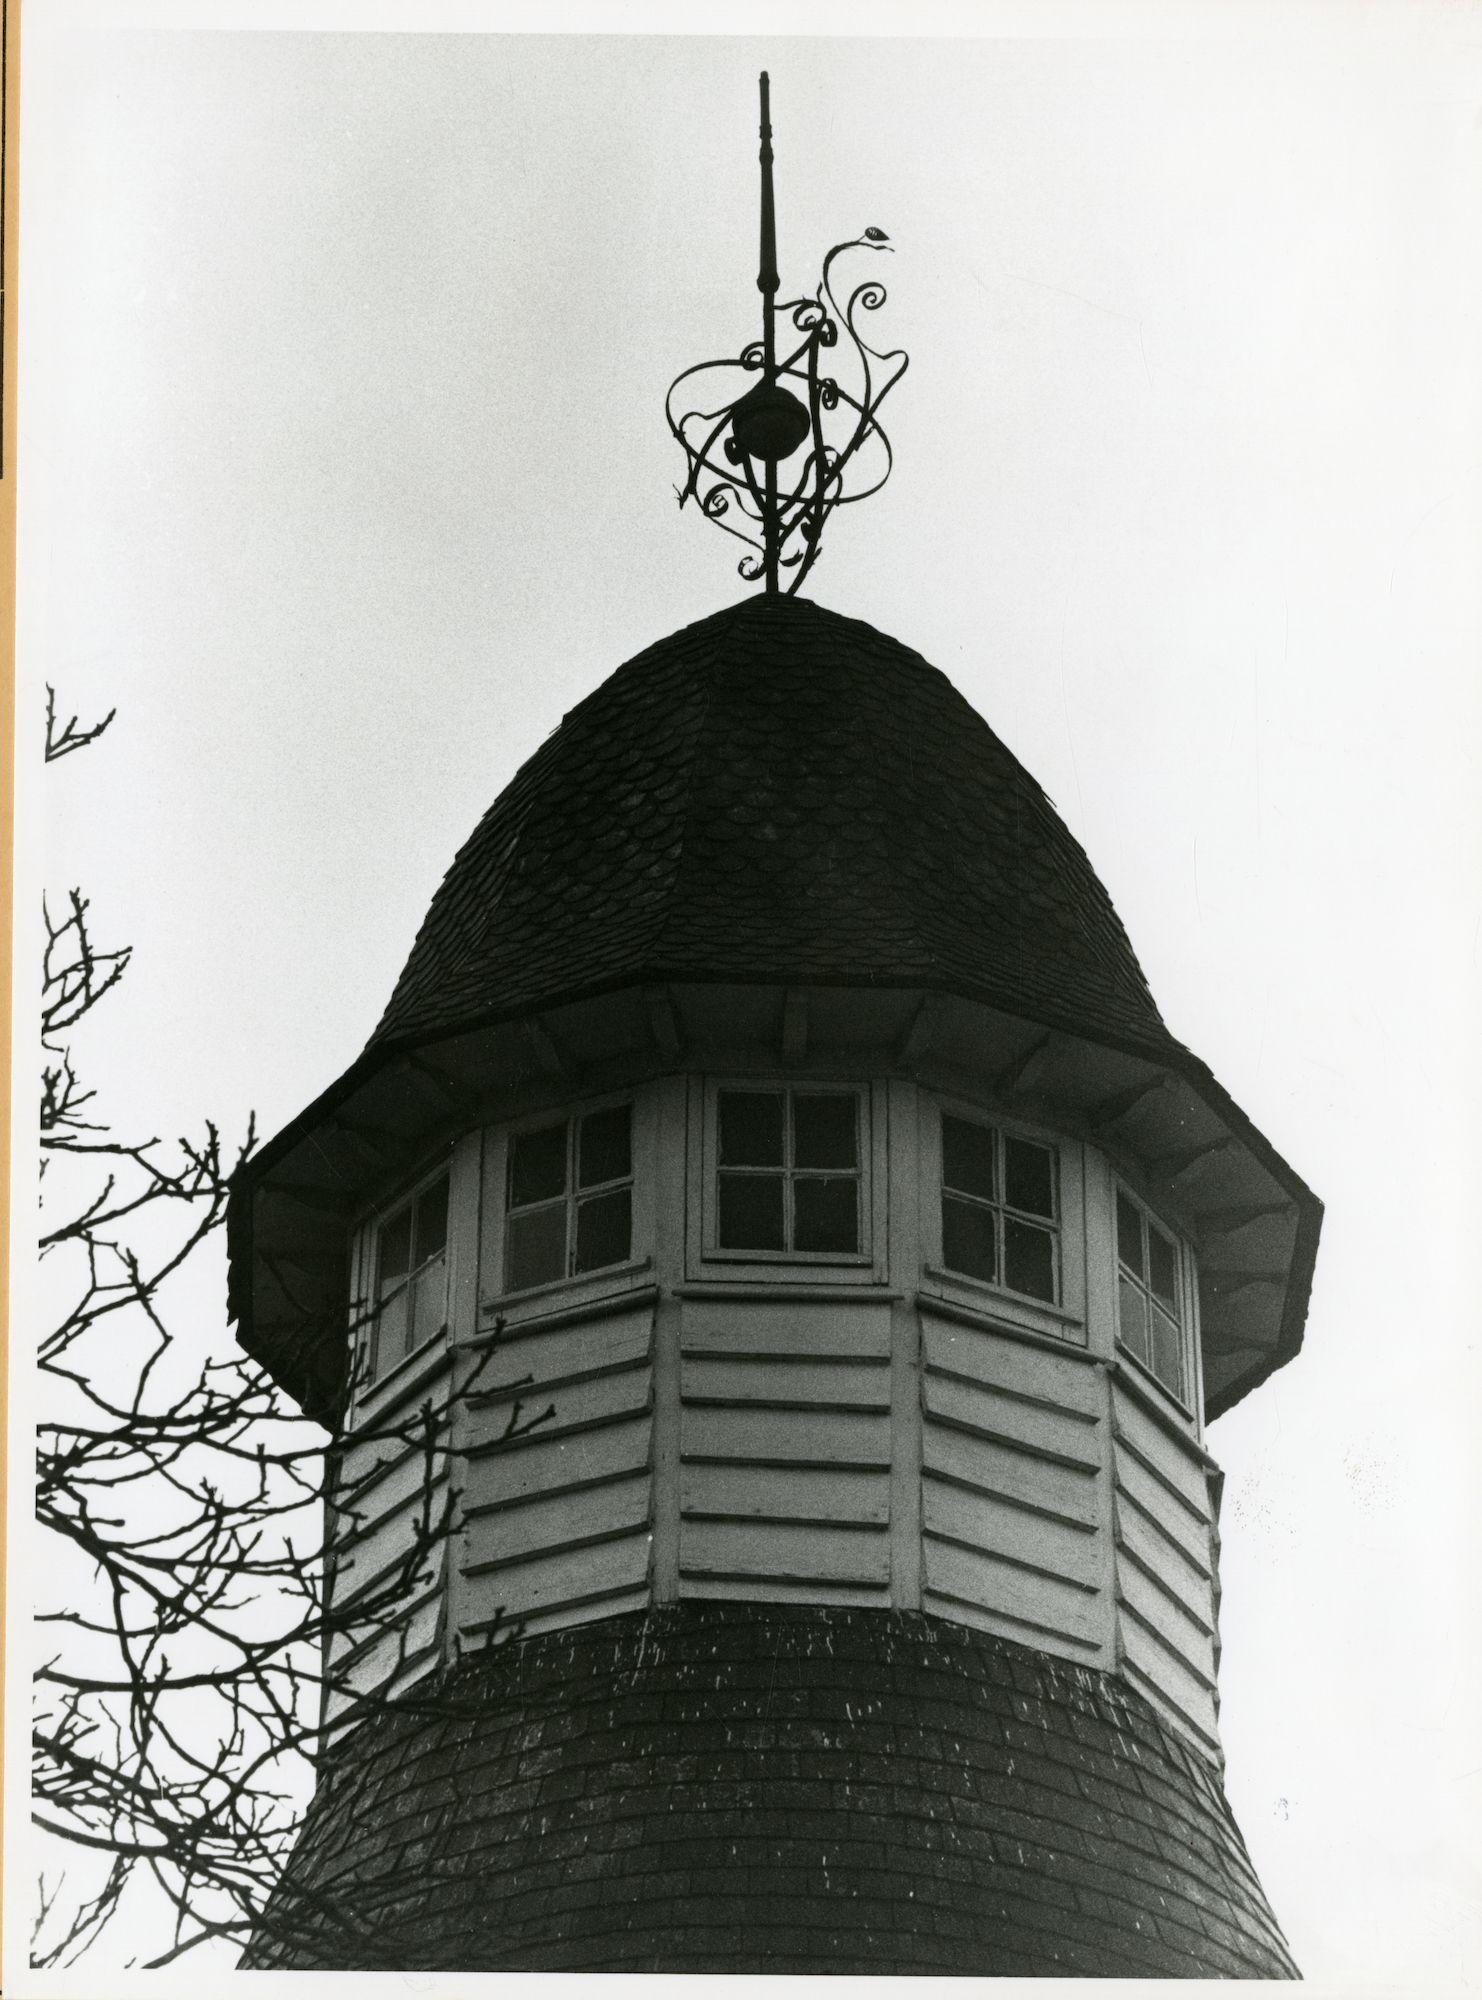 Gent: Koningsdal 30: Smeedwerk, 1979